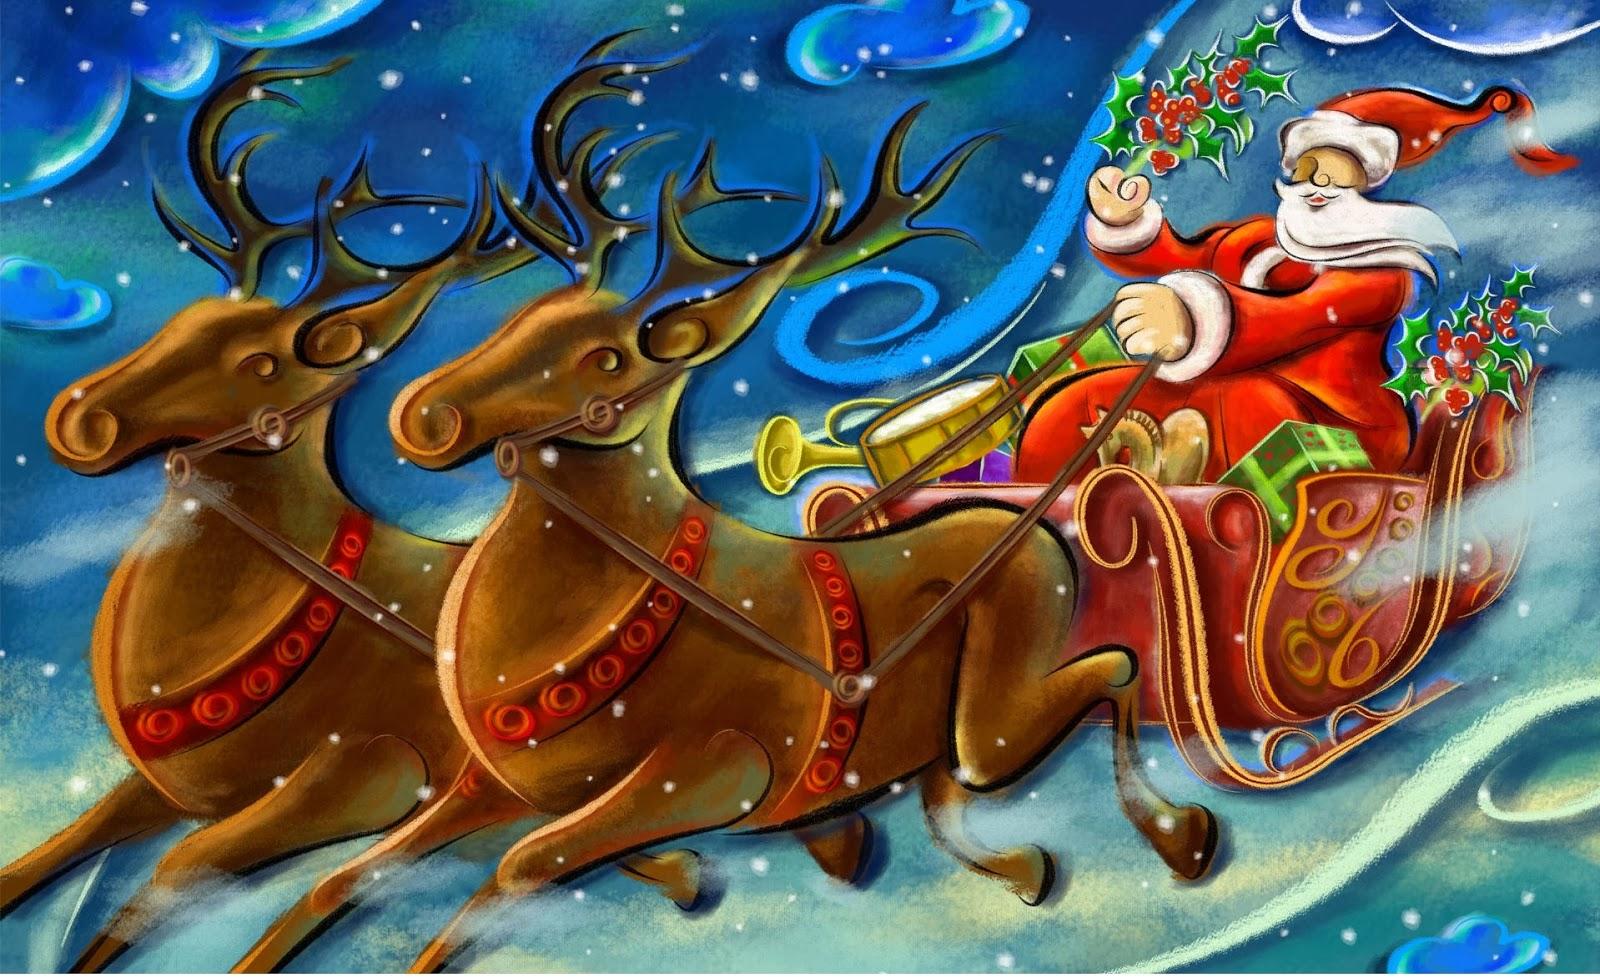 Give Love On Christmas Day - Christmas Song Lyrics - India Bollywood Sms